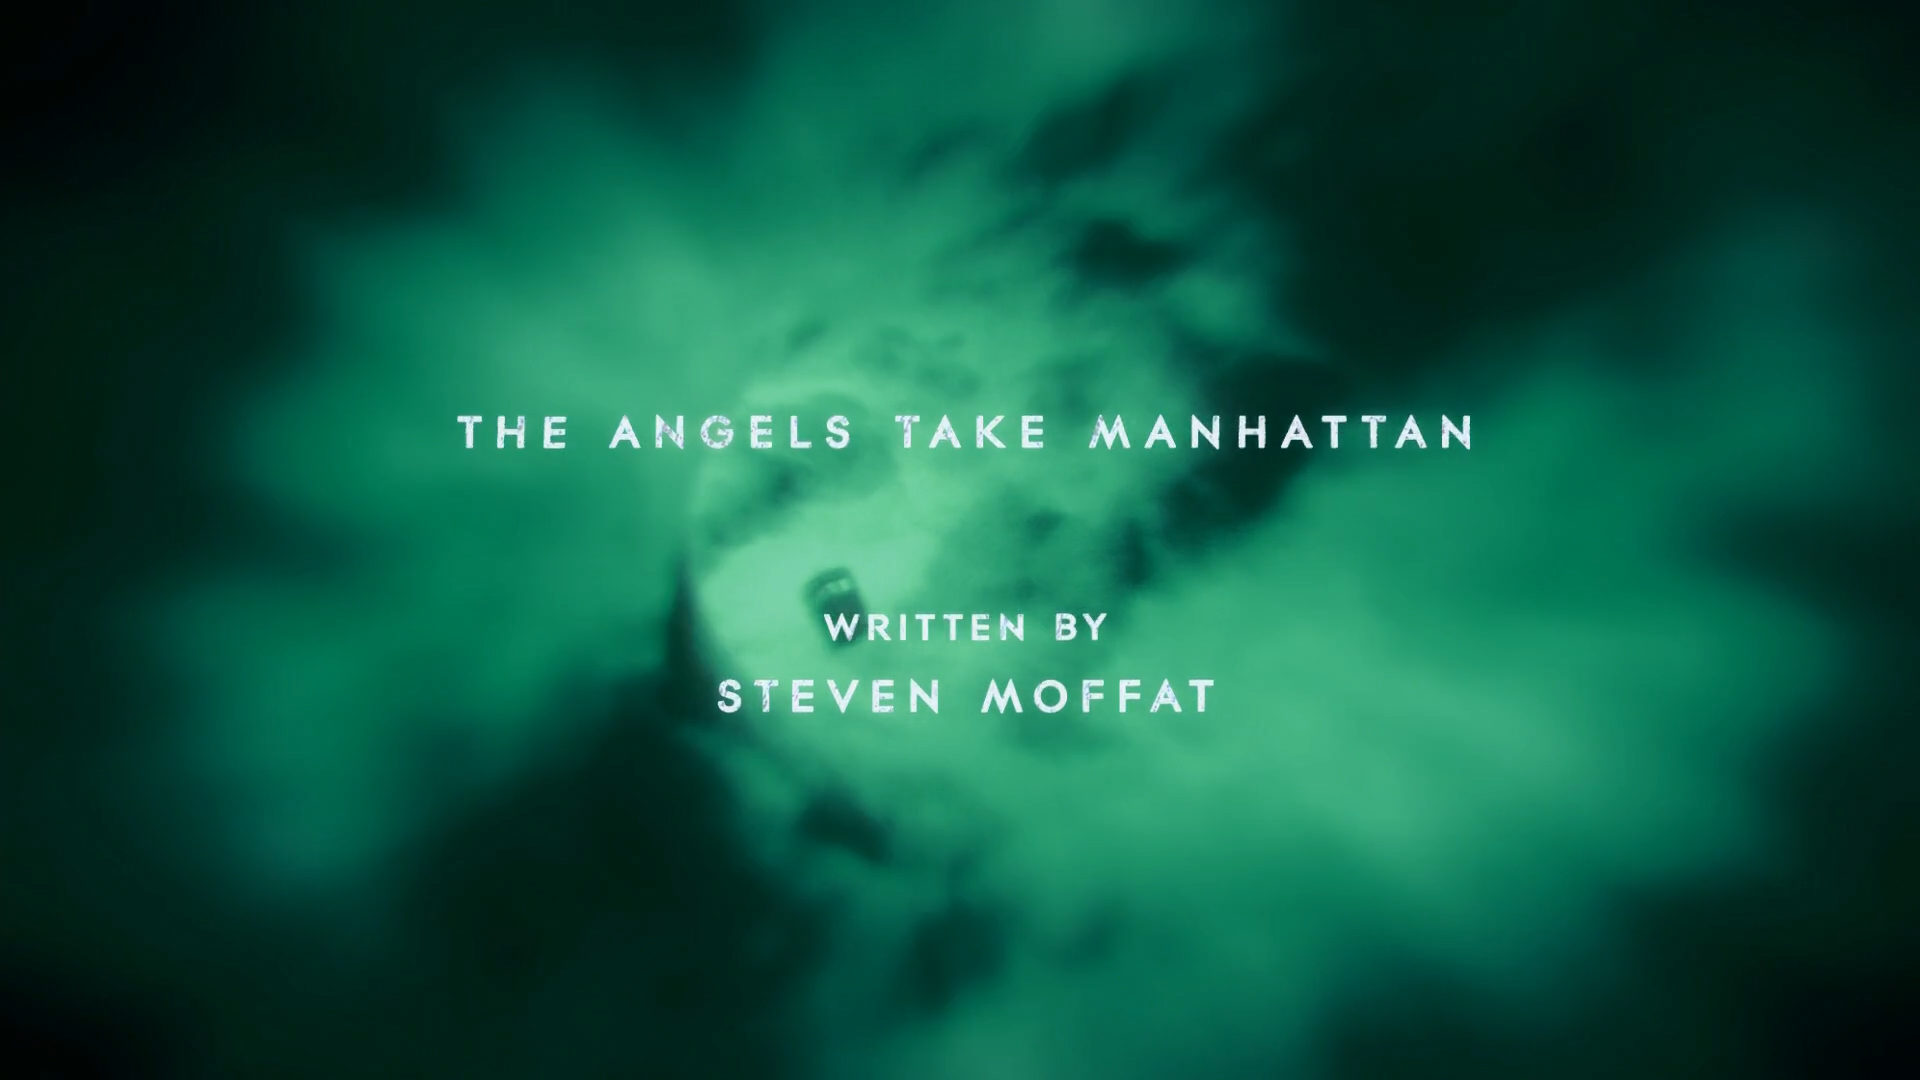 File:300px-The angels take manhattan.jpg